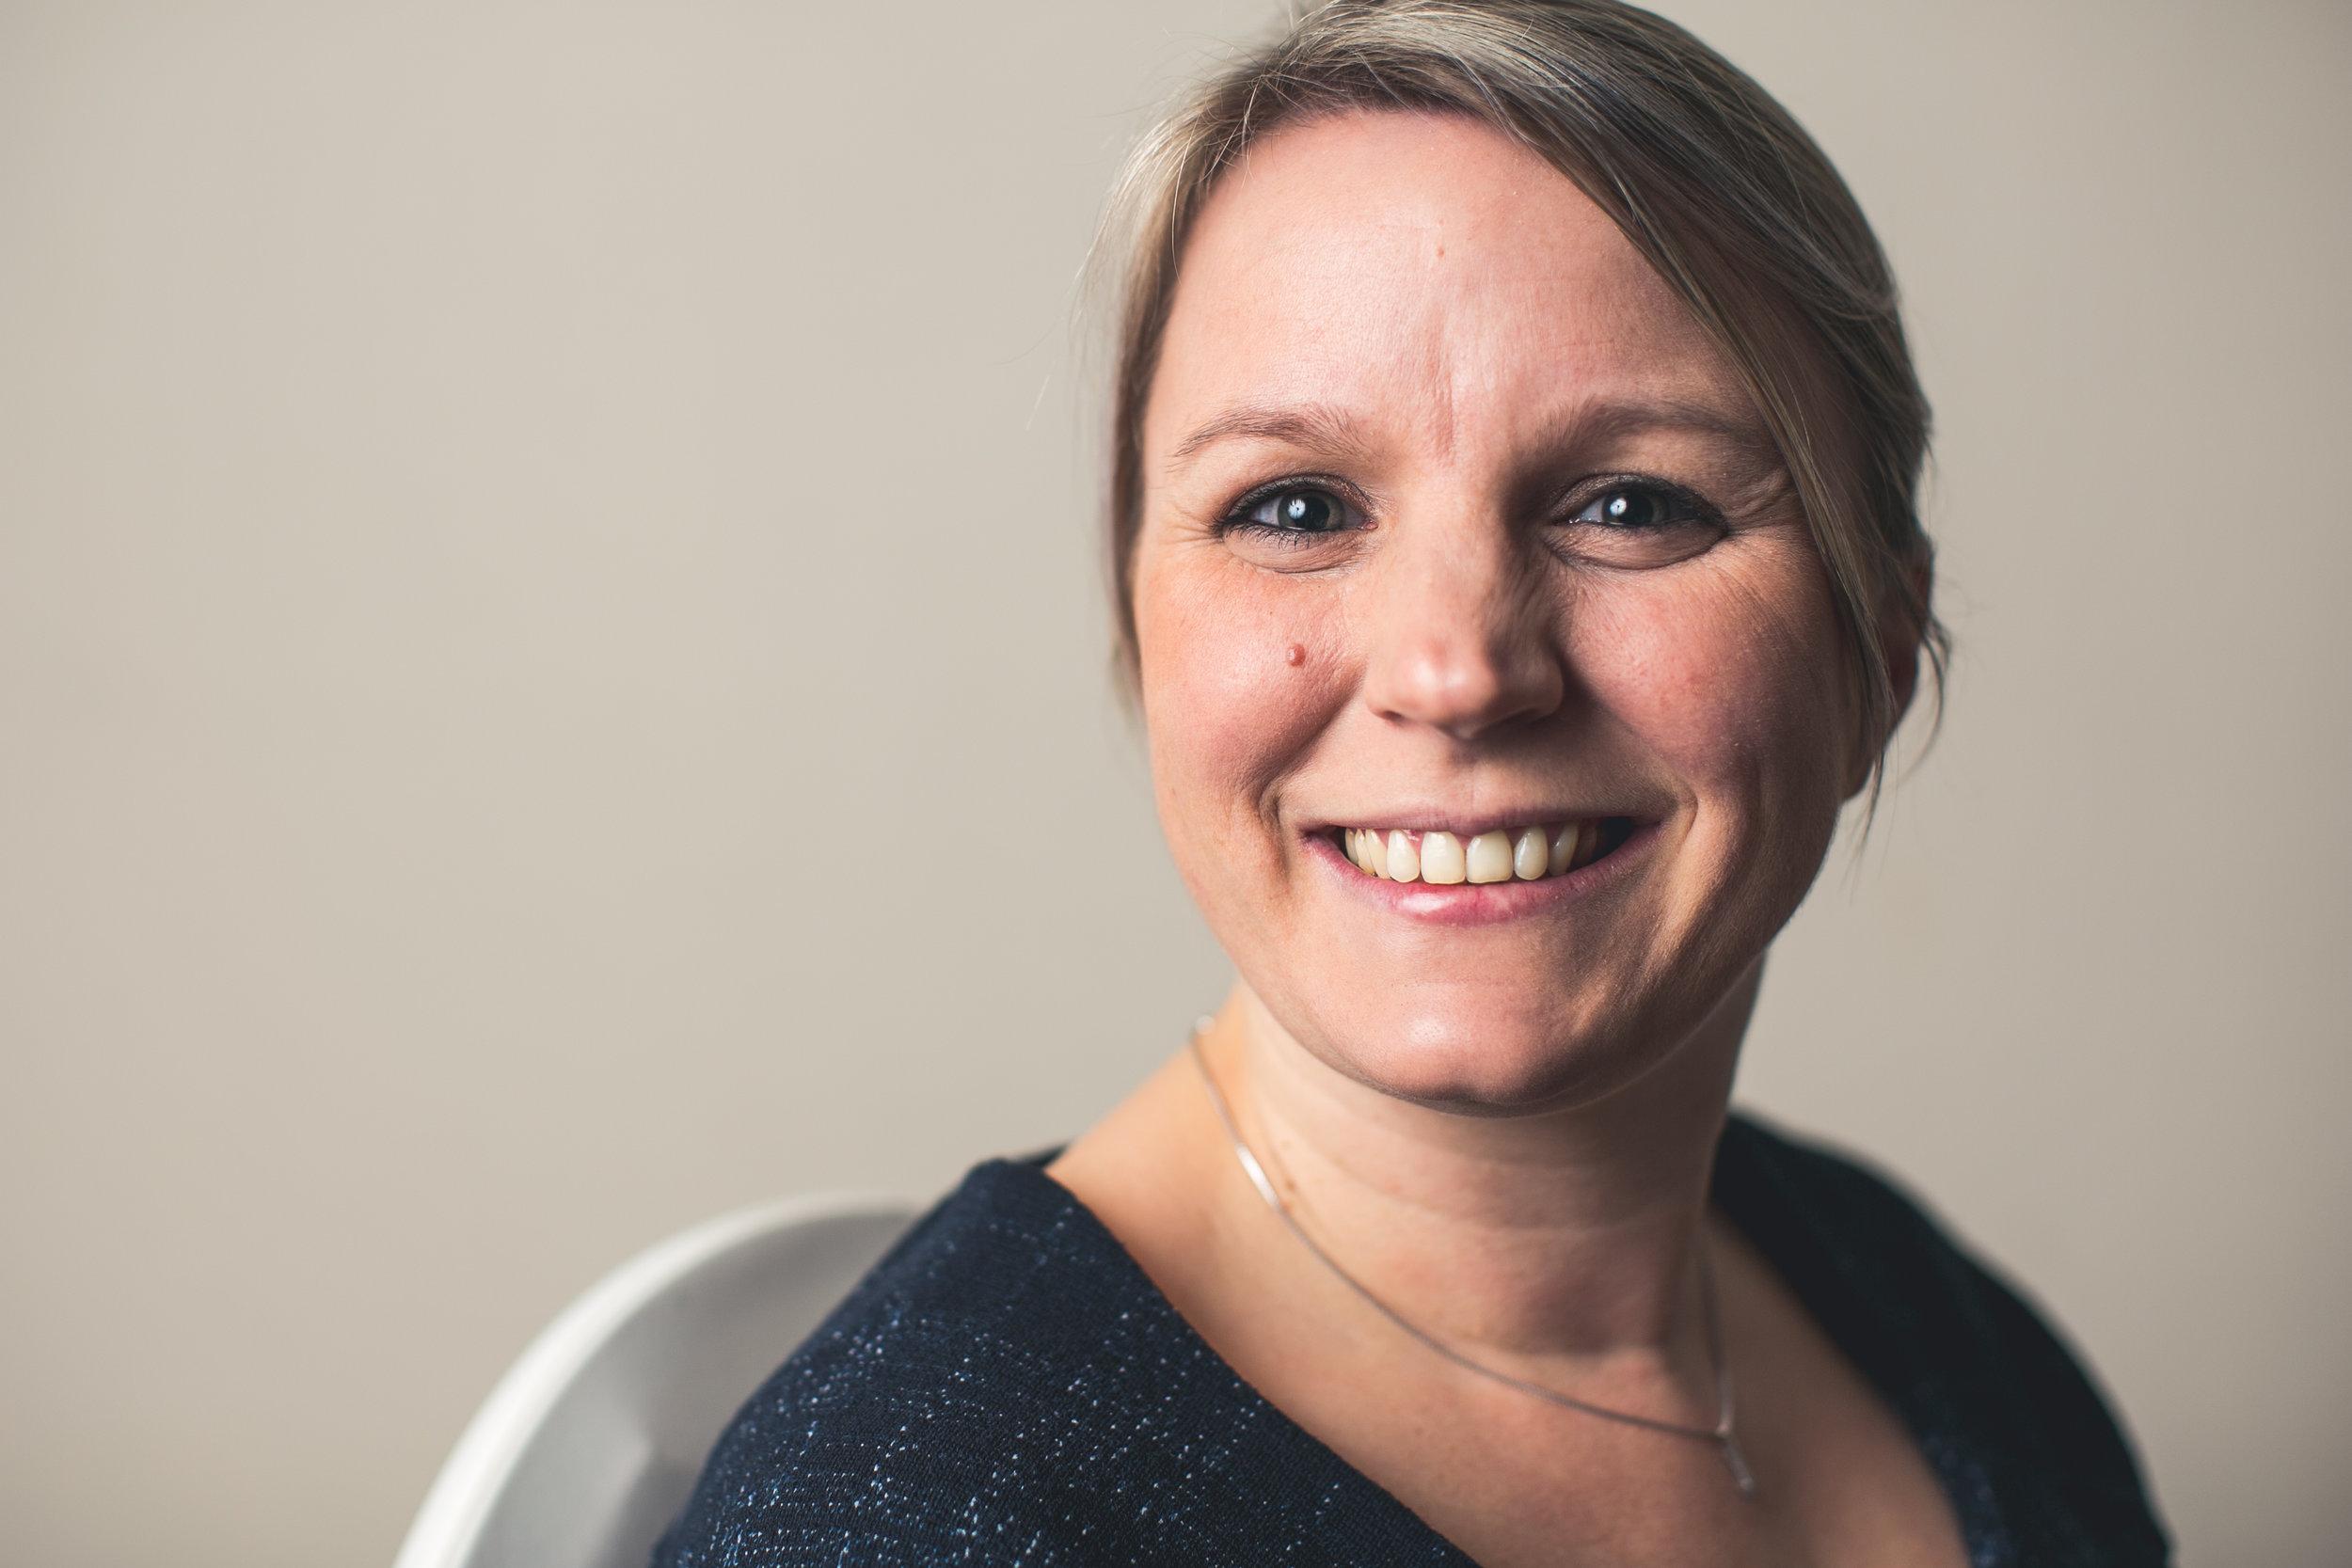 Ruth cooman - klinisch assistente